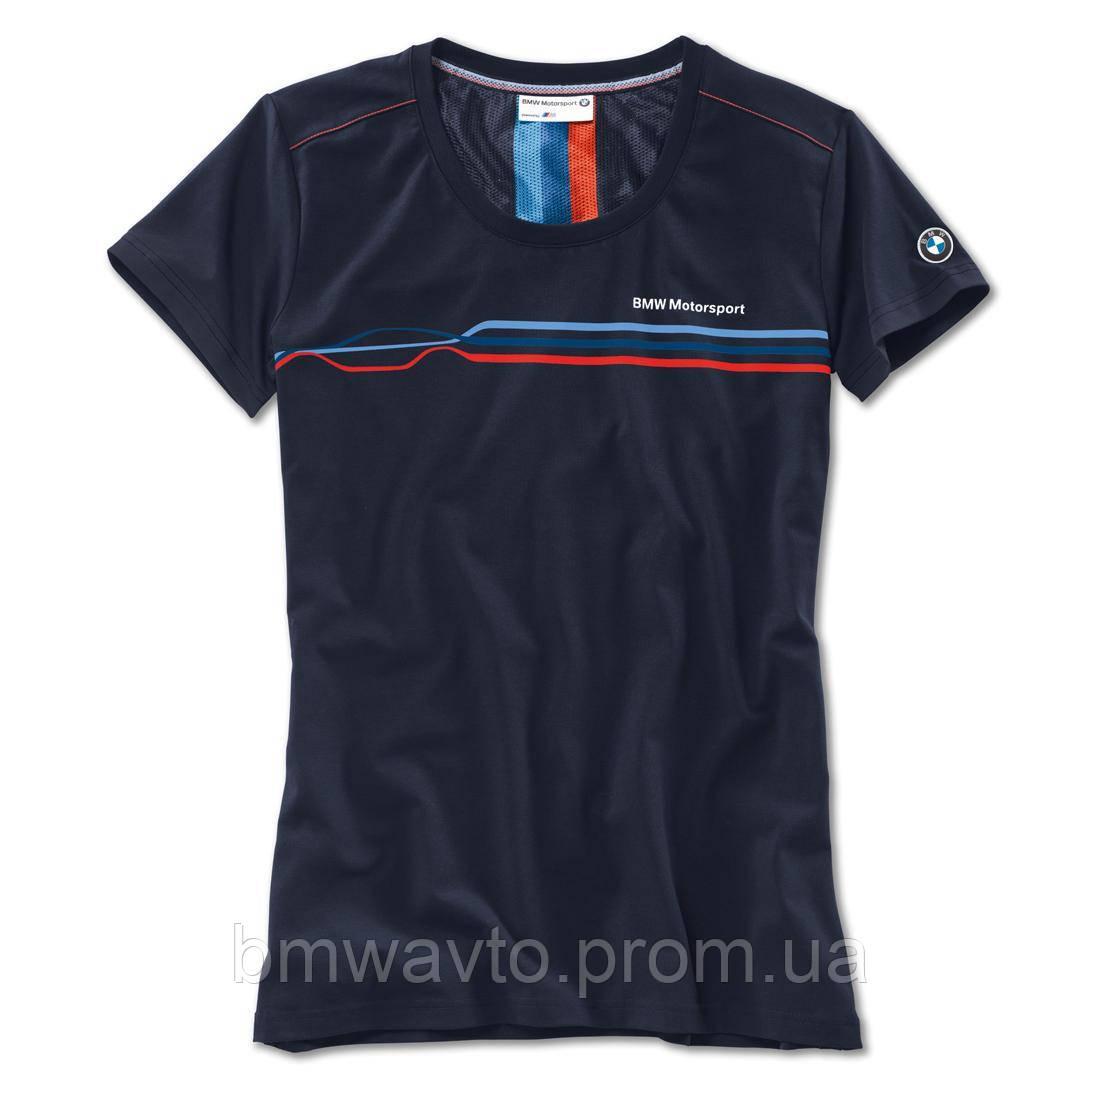 Женская футболка BMW Motorsport Fashion T-Shirt